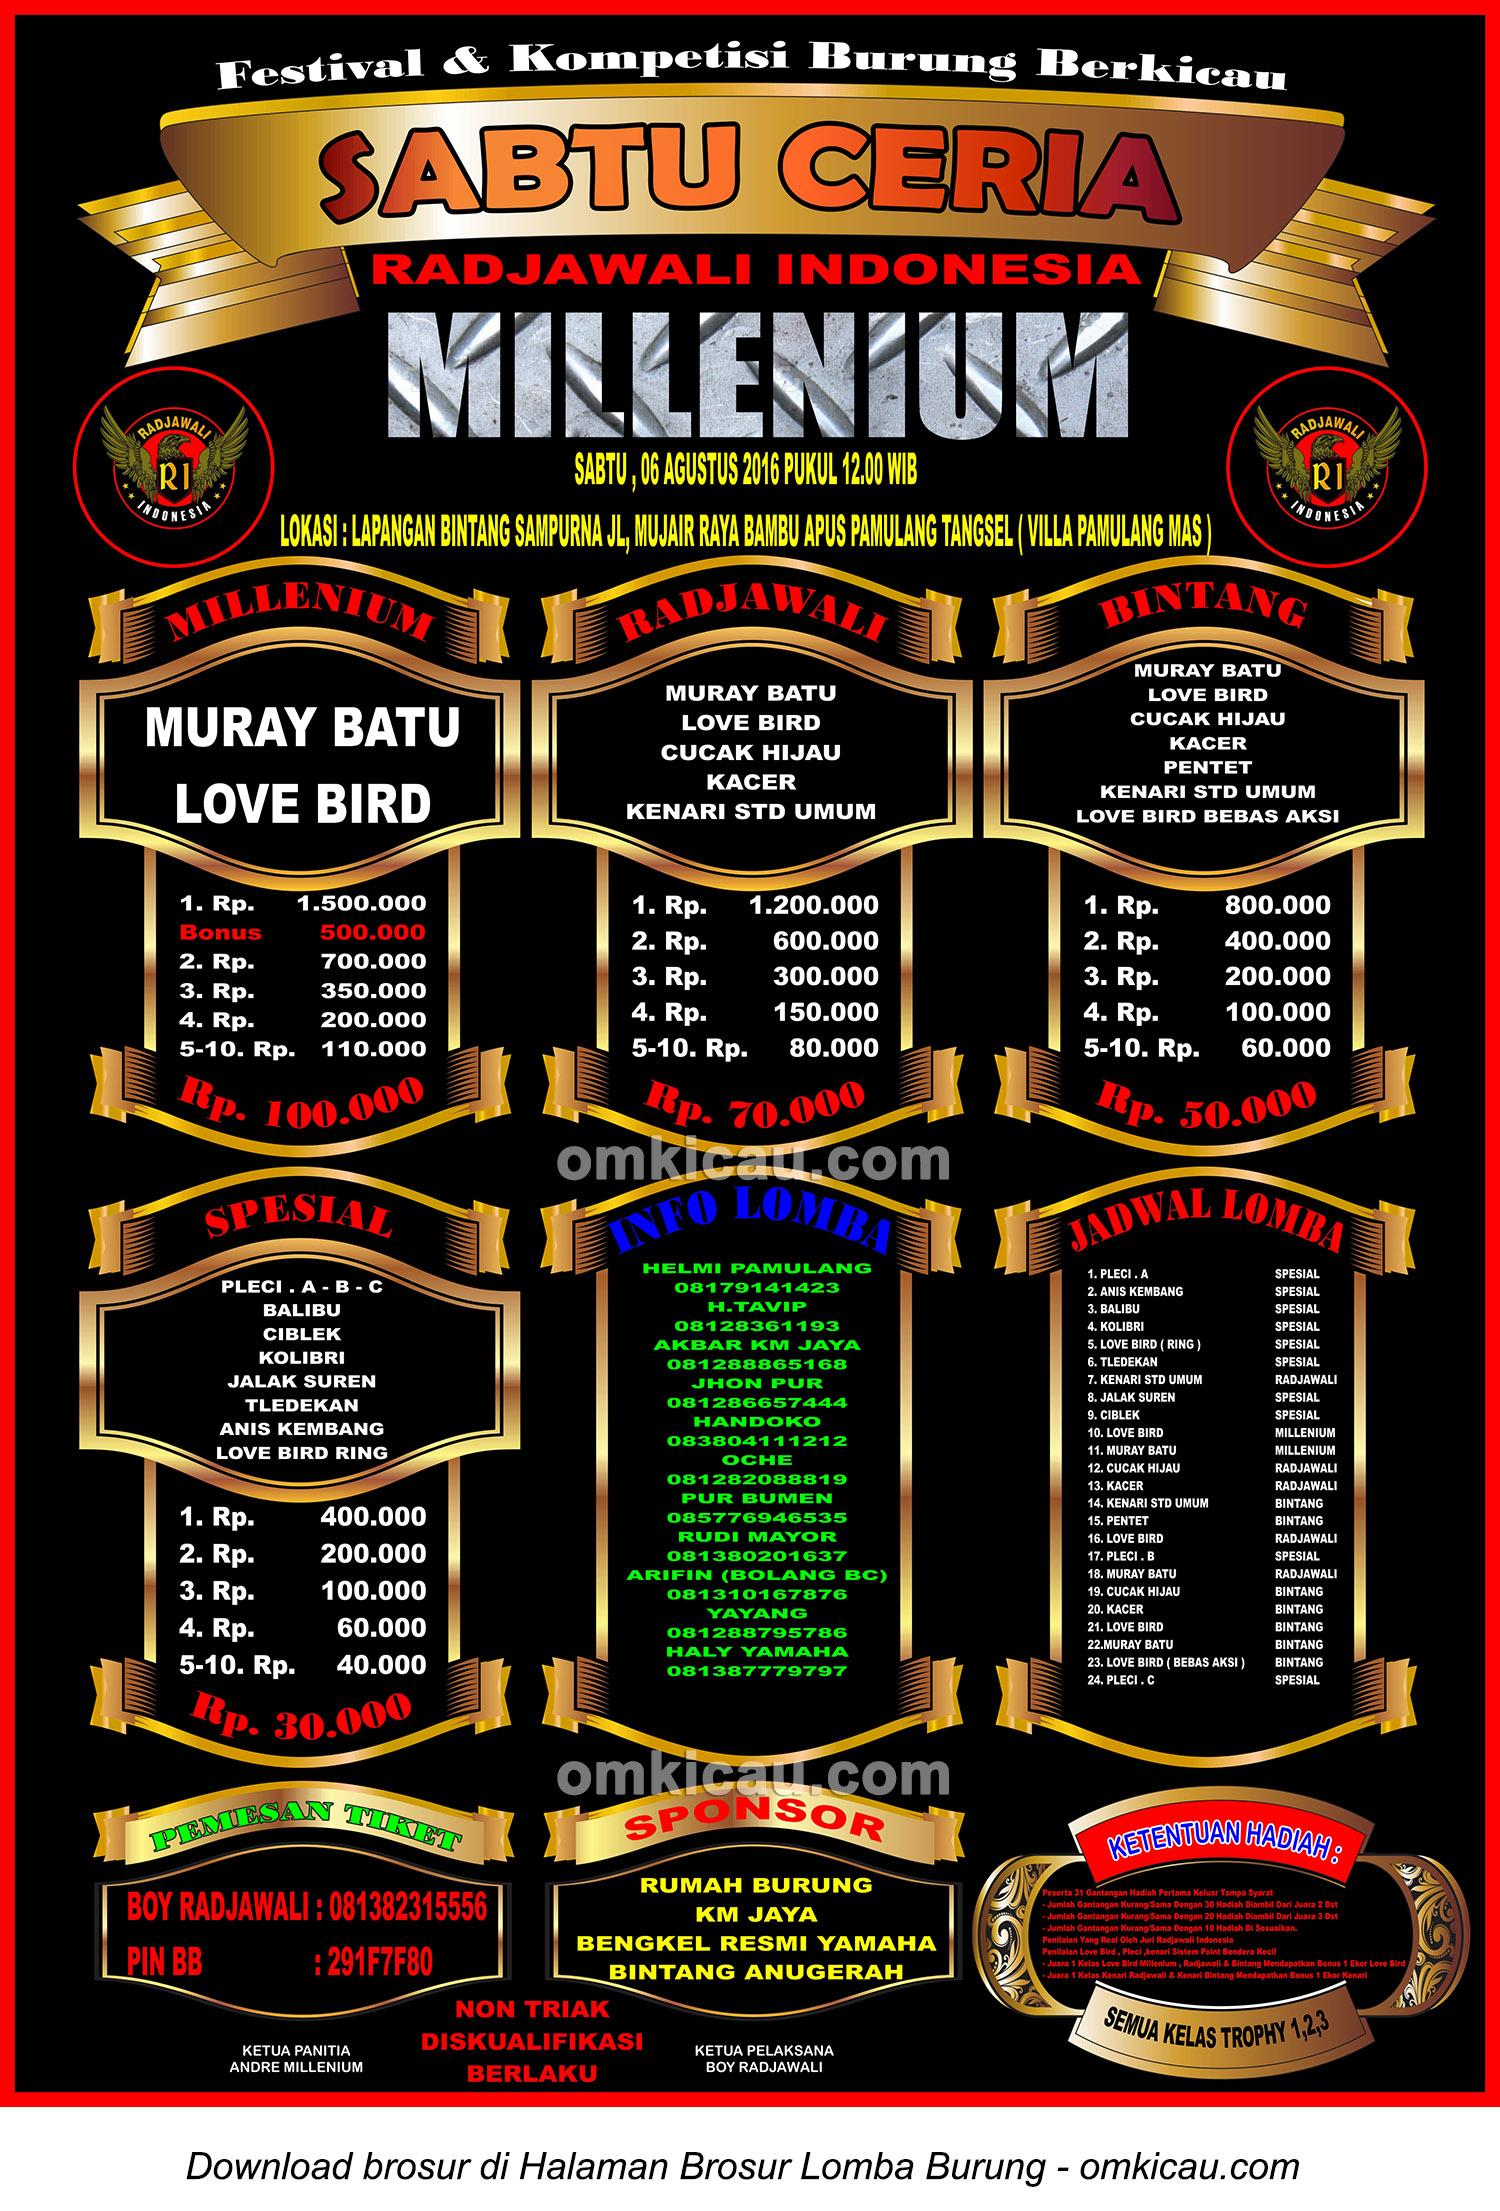 Brosur Lomba Burung Berkicau Sabtu Ceria Millenium, Tangerang Selatan, 6 Agustus 2016